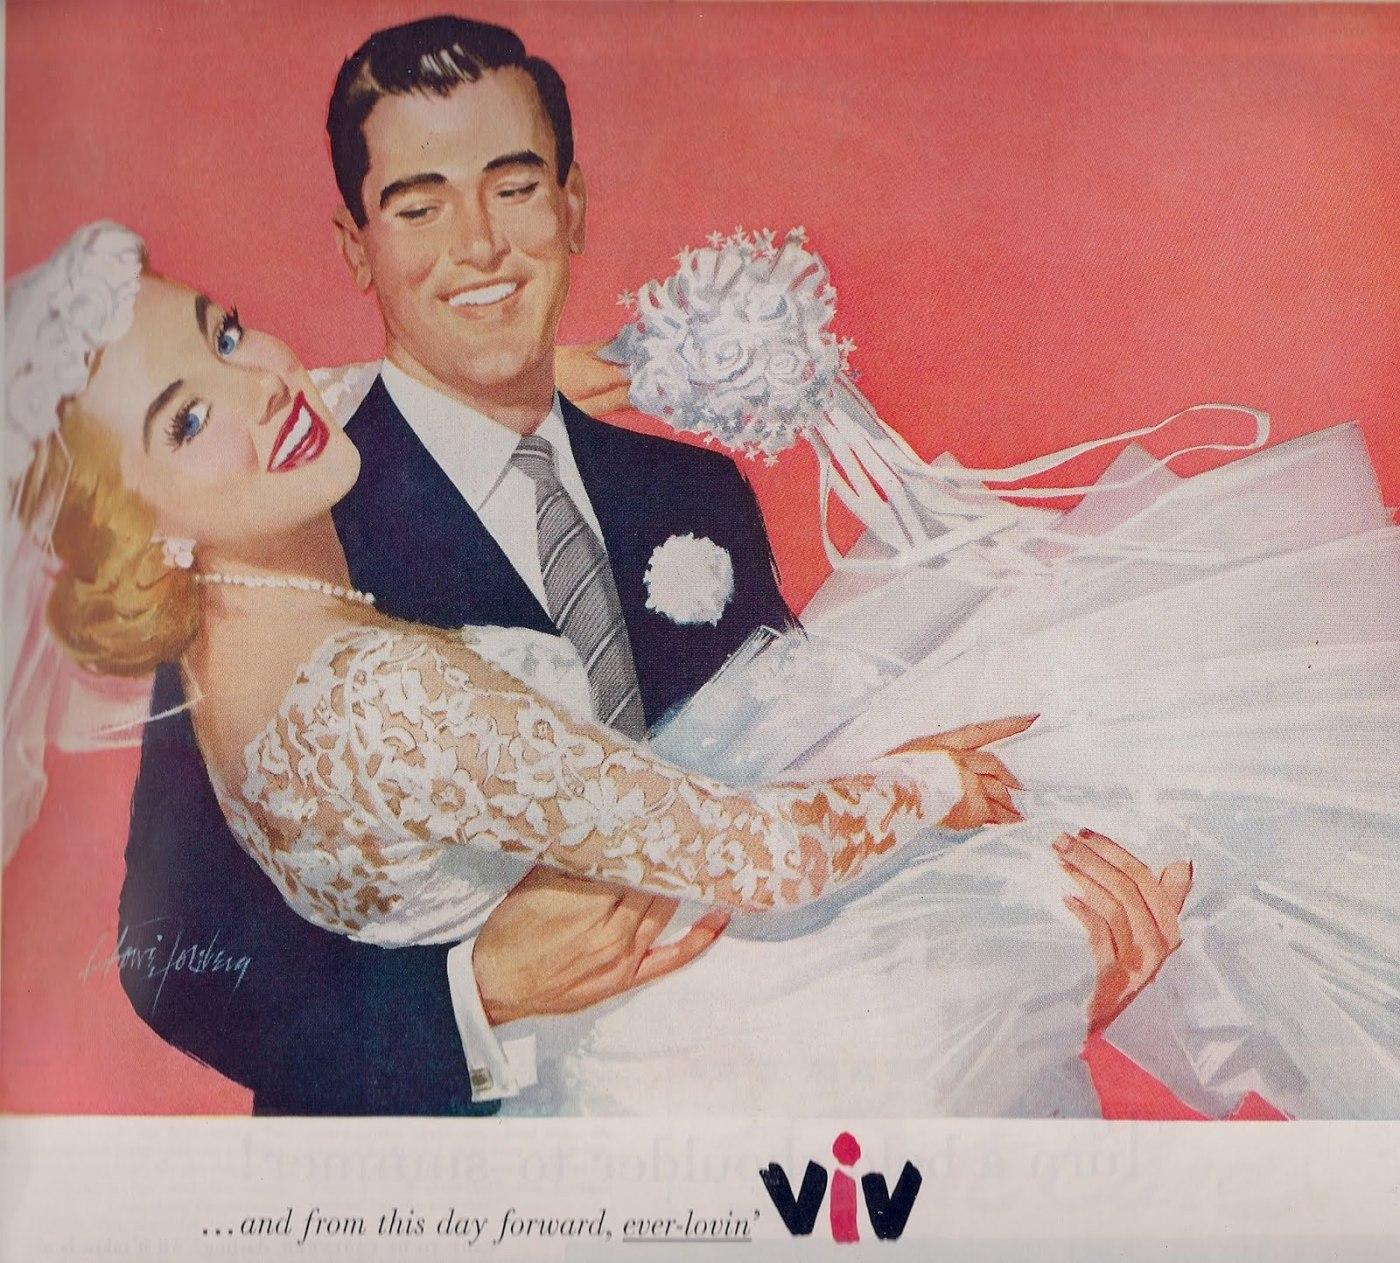 1950s wedding illustration